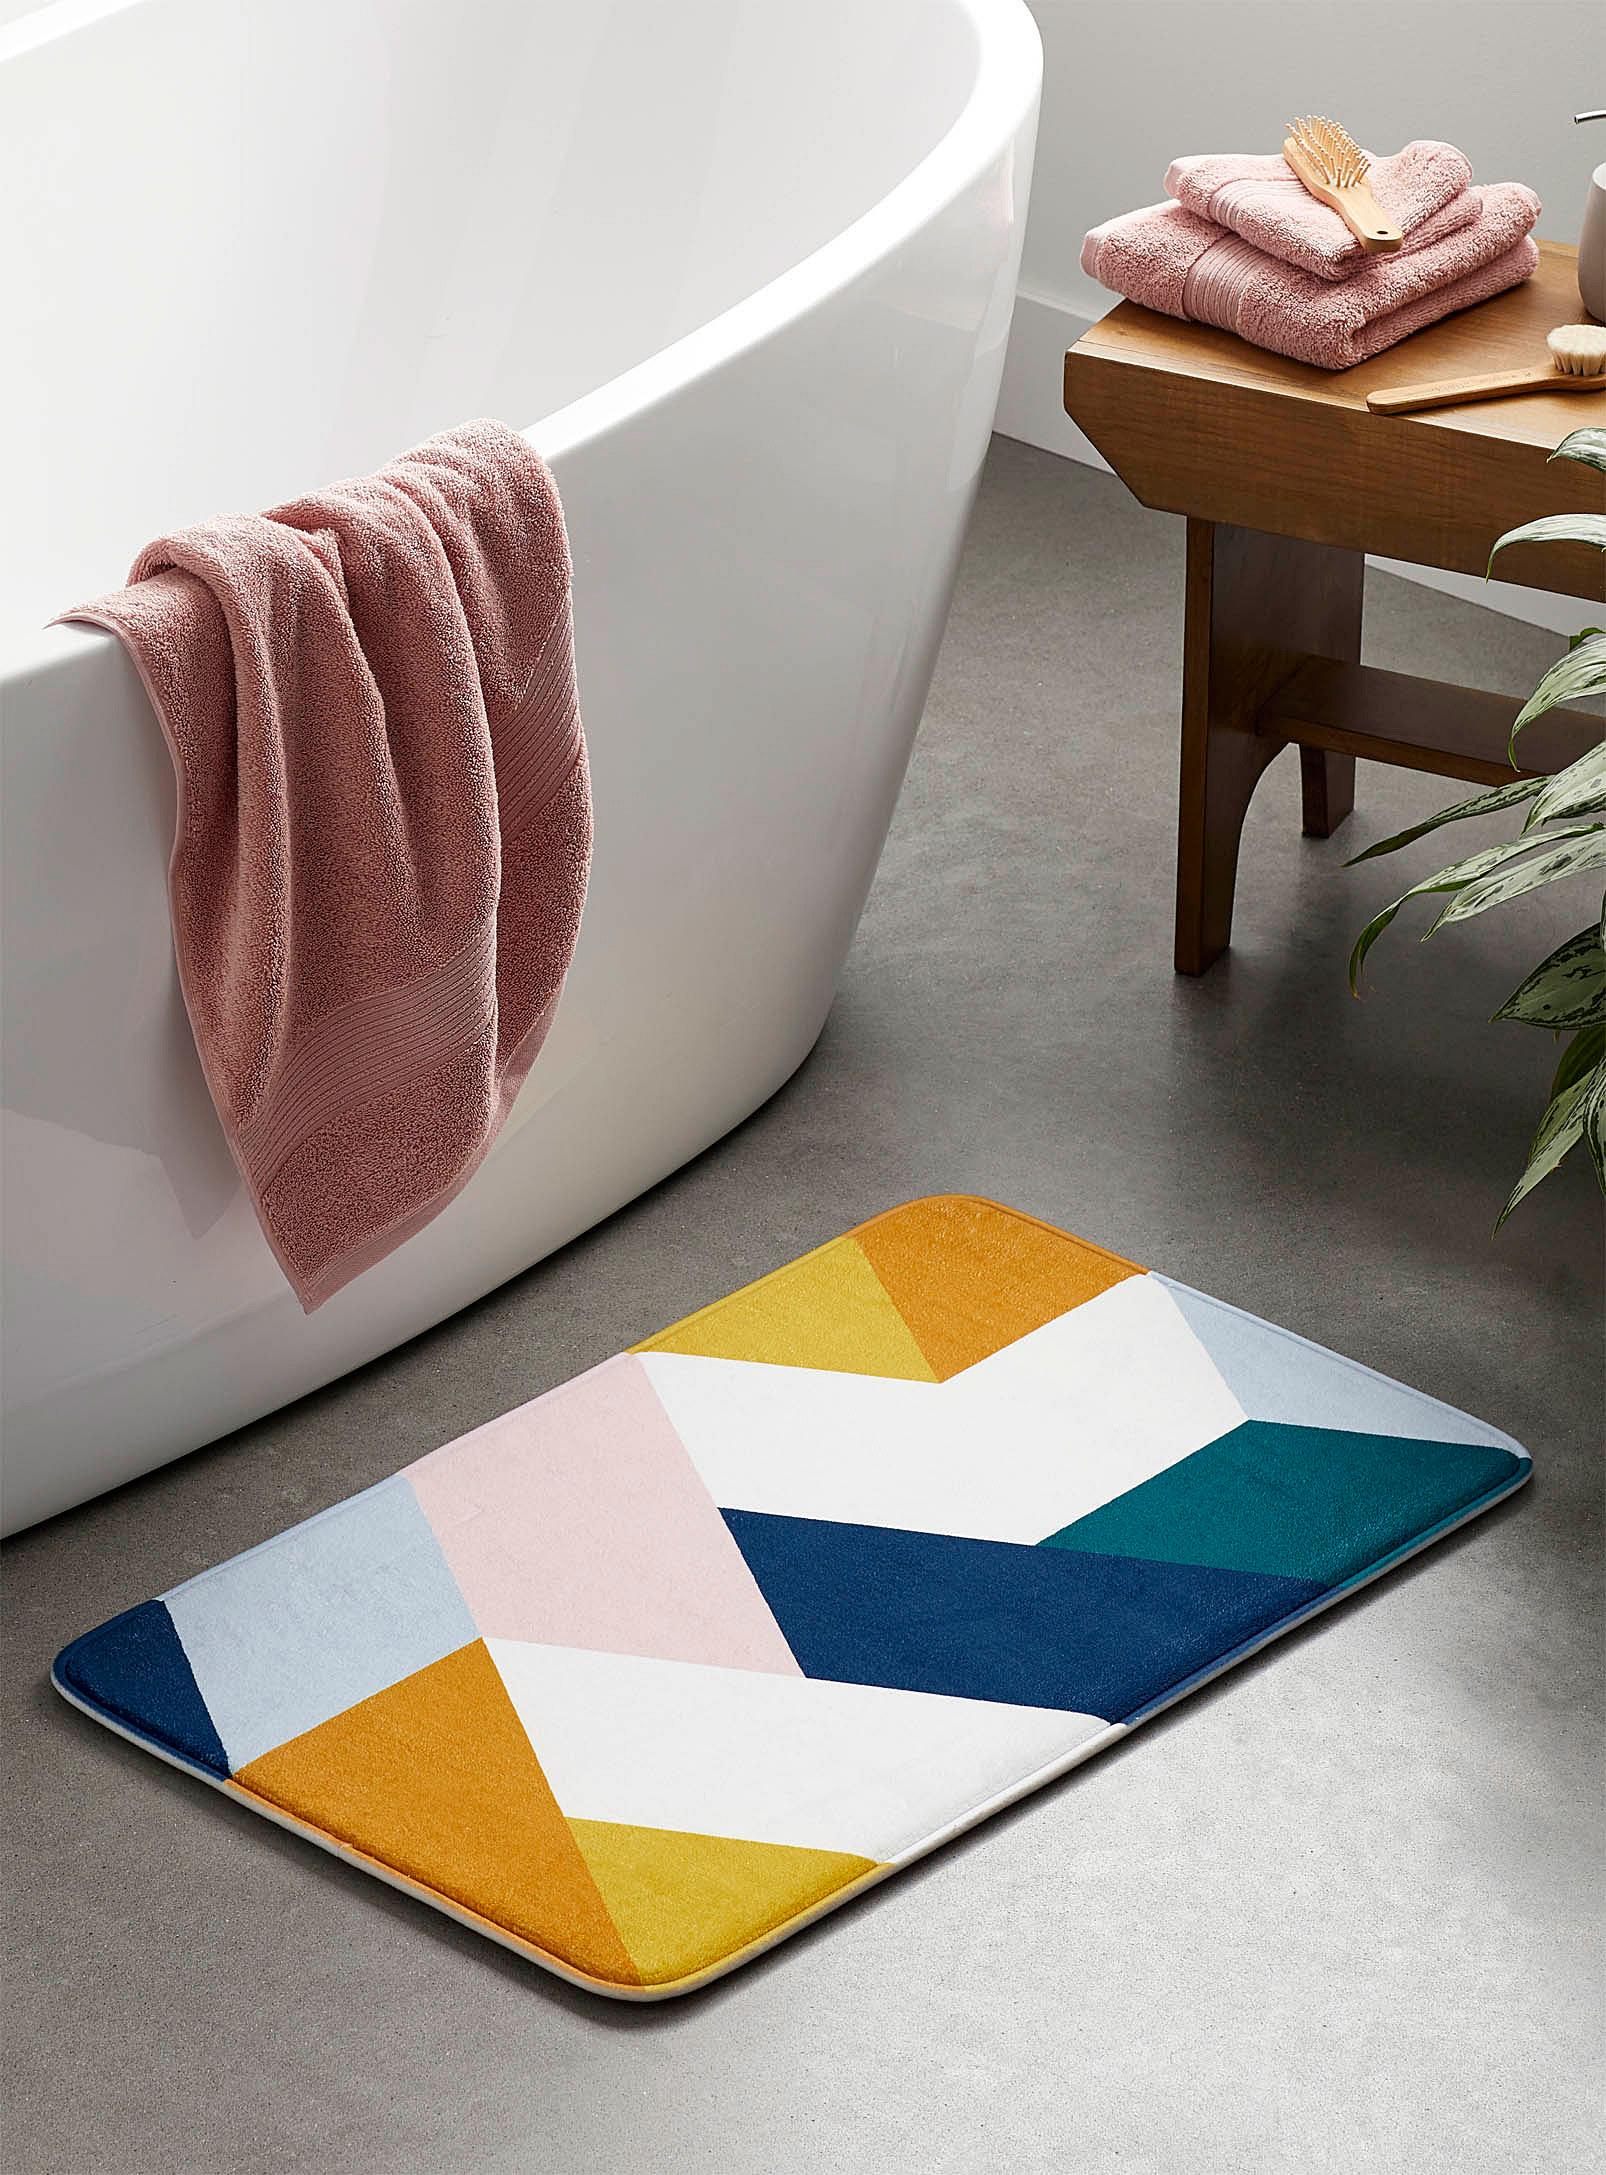 A bathmat with geometric shapes on it